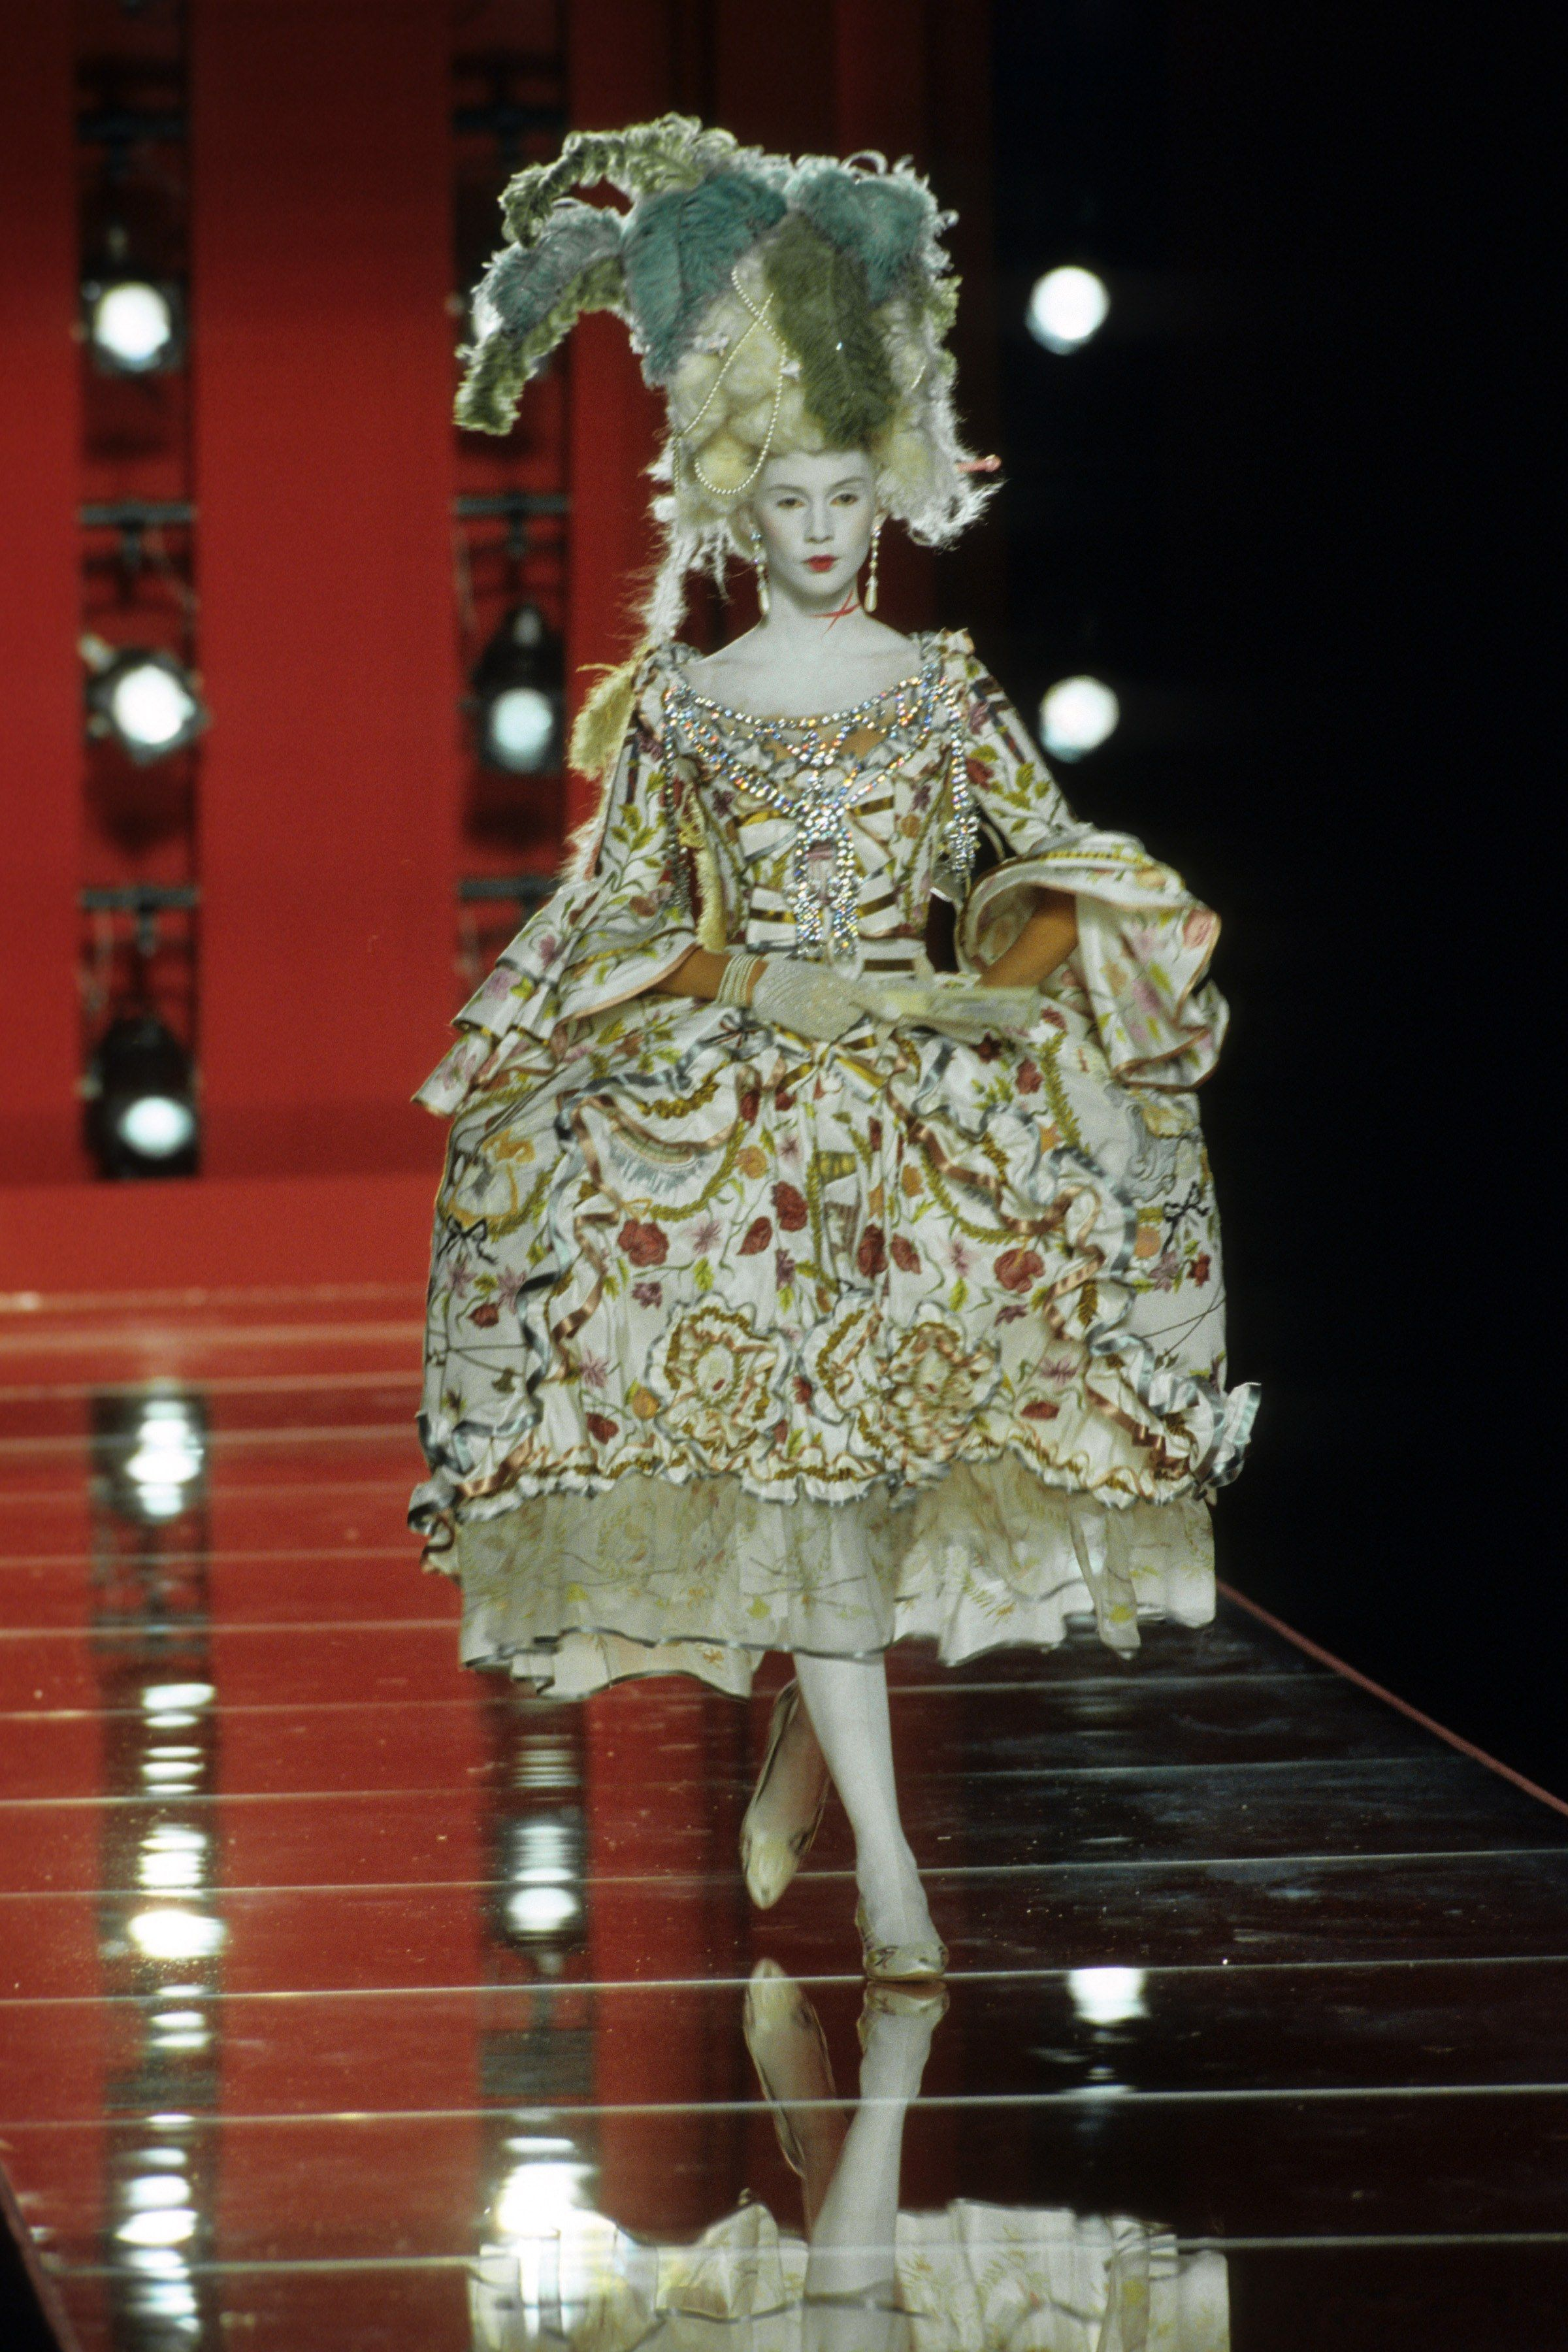 f3bee603362 Christian Dior Fall 2000 Couture Fashion Show - designer John Galliano.